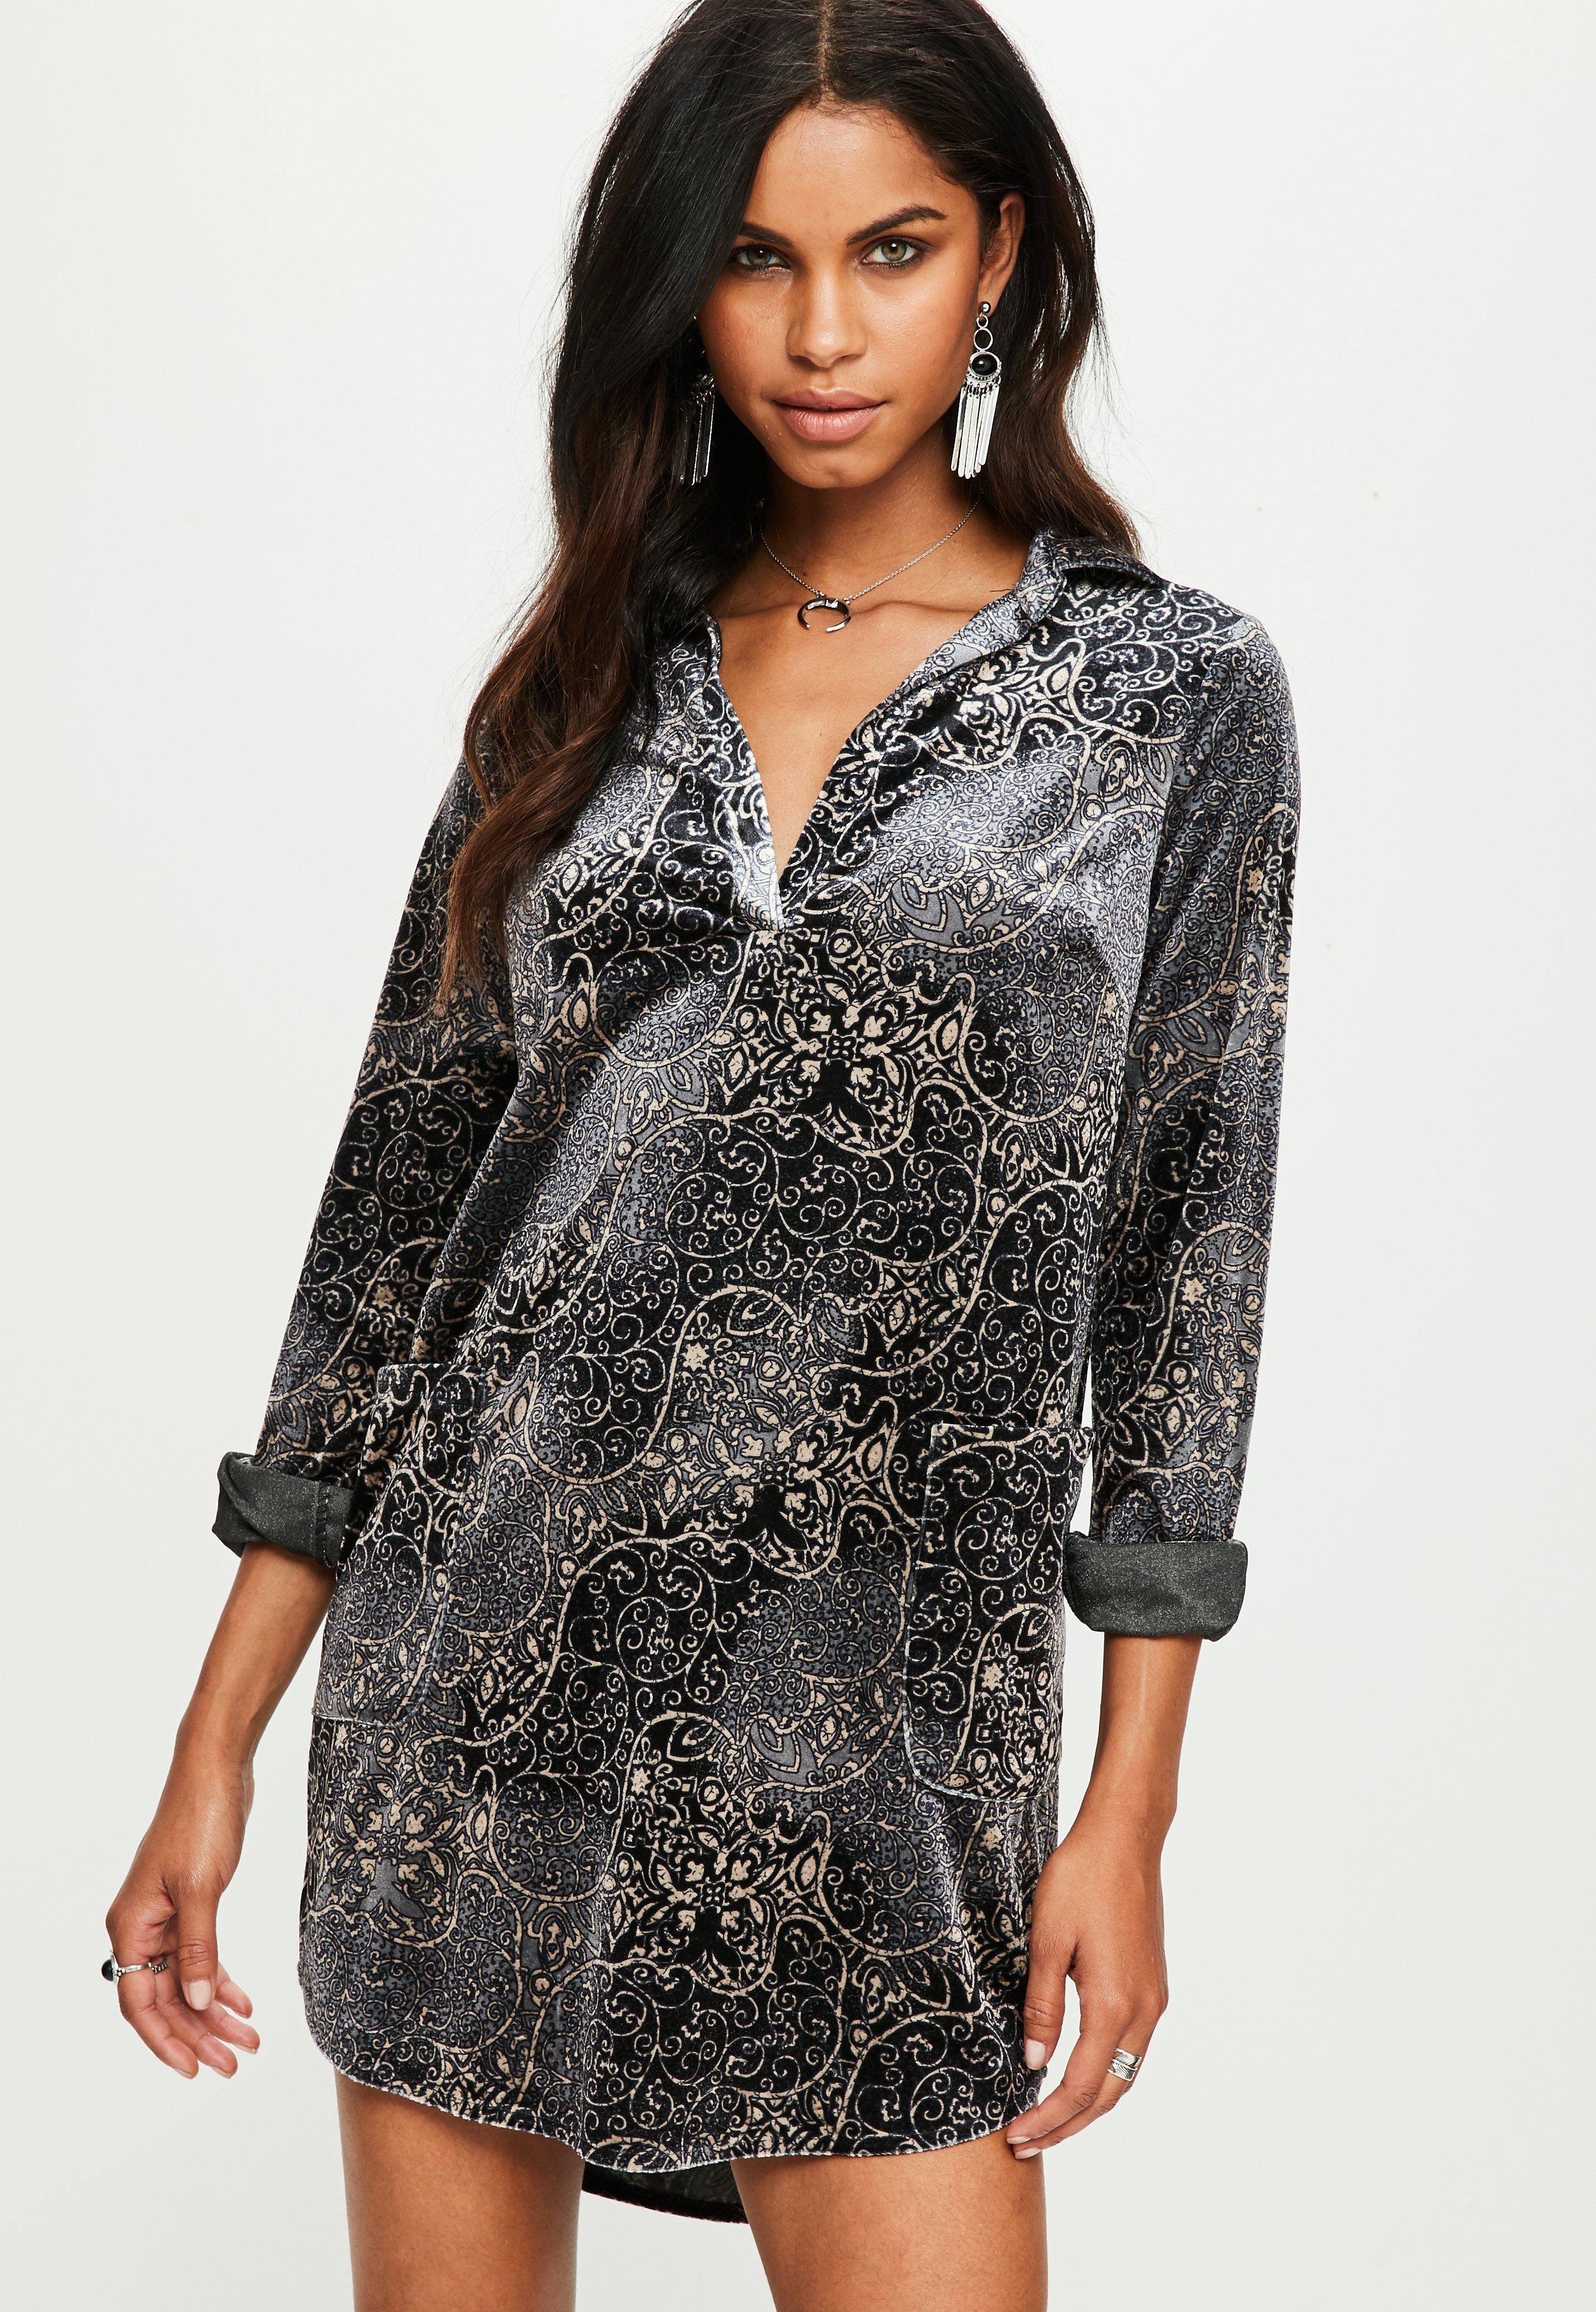 Plunge Dresses | V Neck & Low Cut Dresses - Missguided